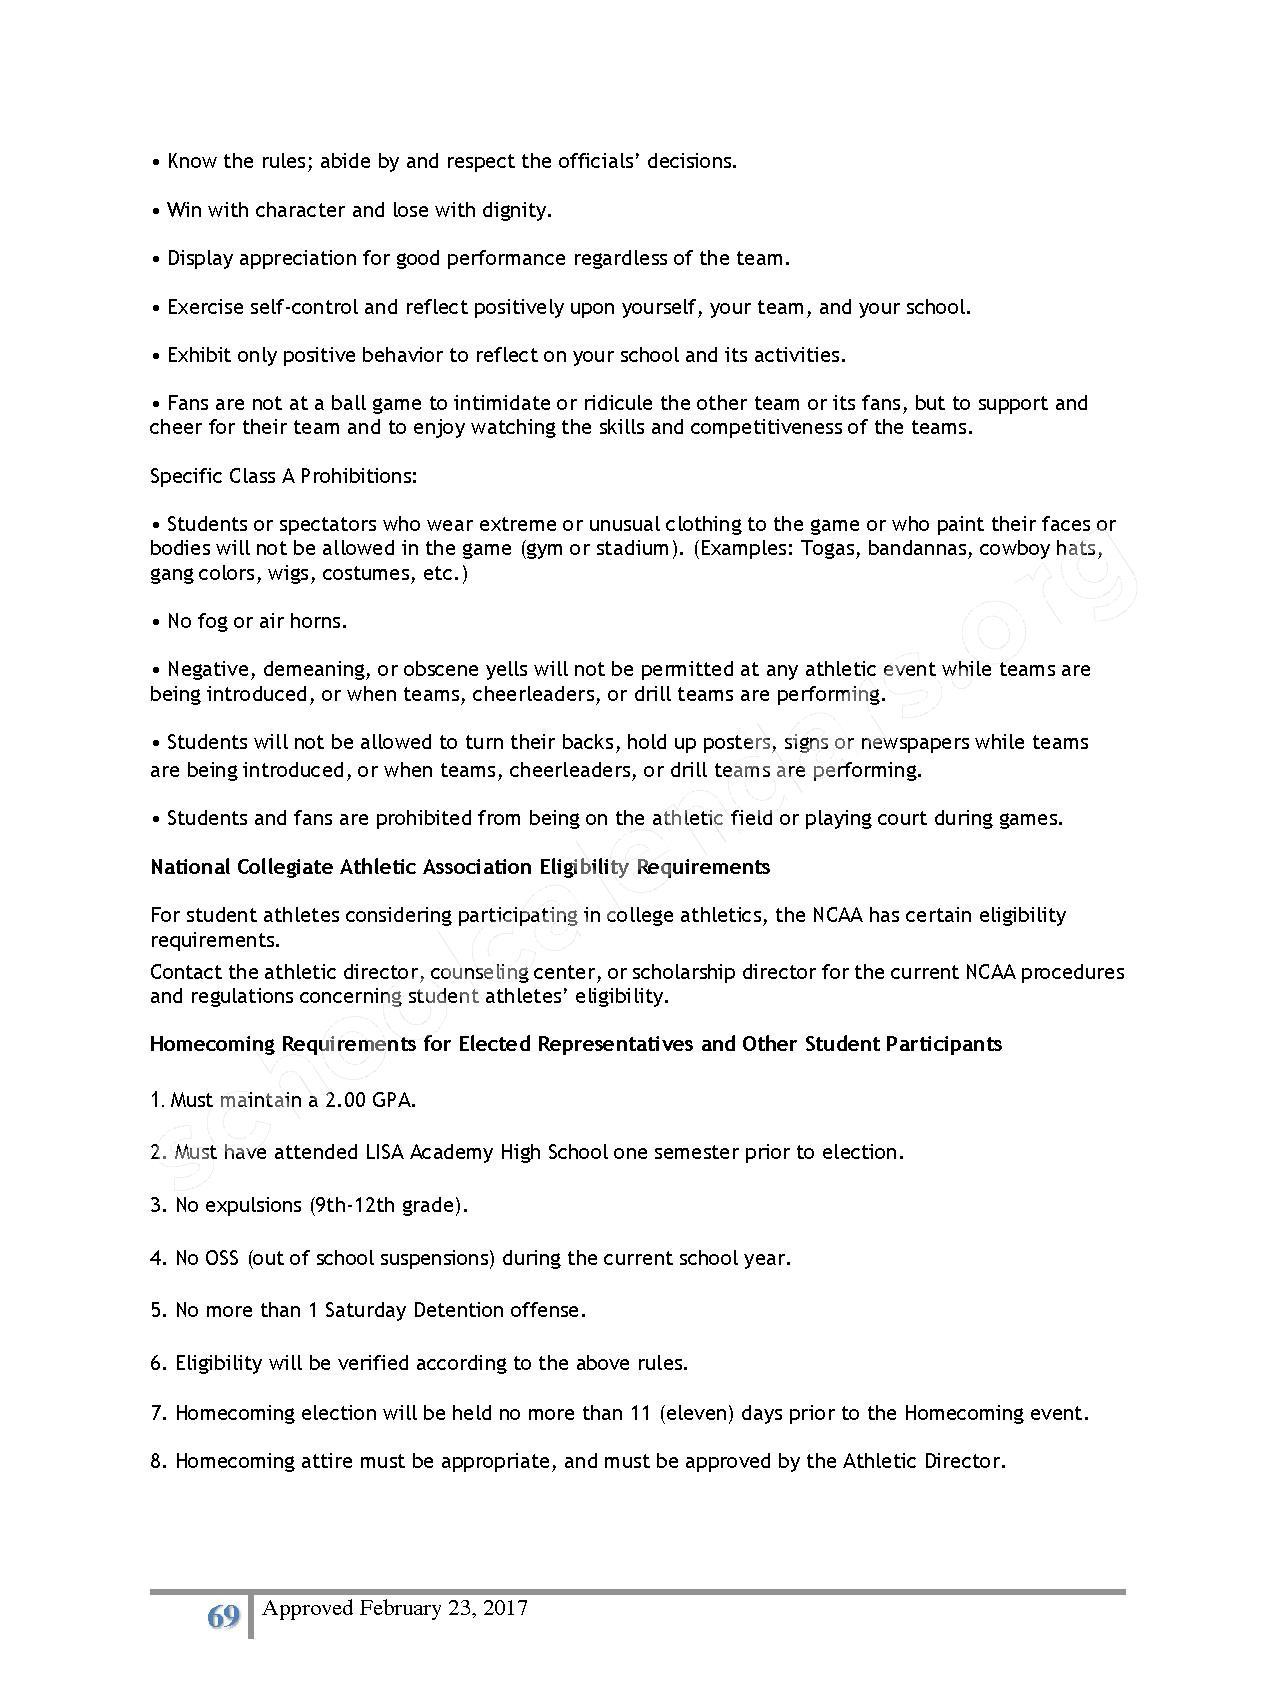 2016 - 2017 District Calendar – Lisa Academy Public Charter Schools – page 69